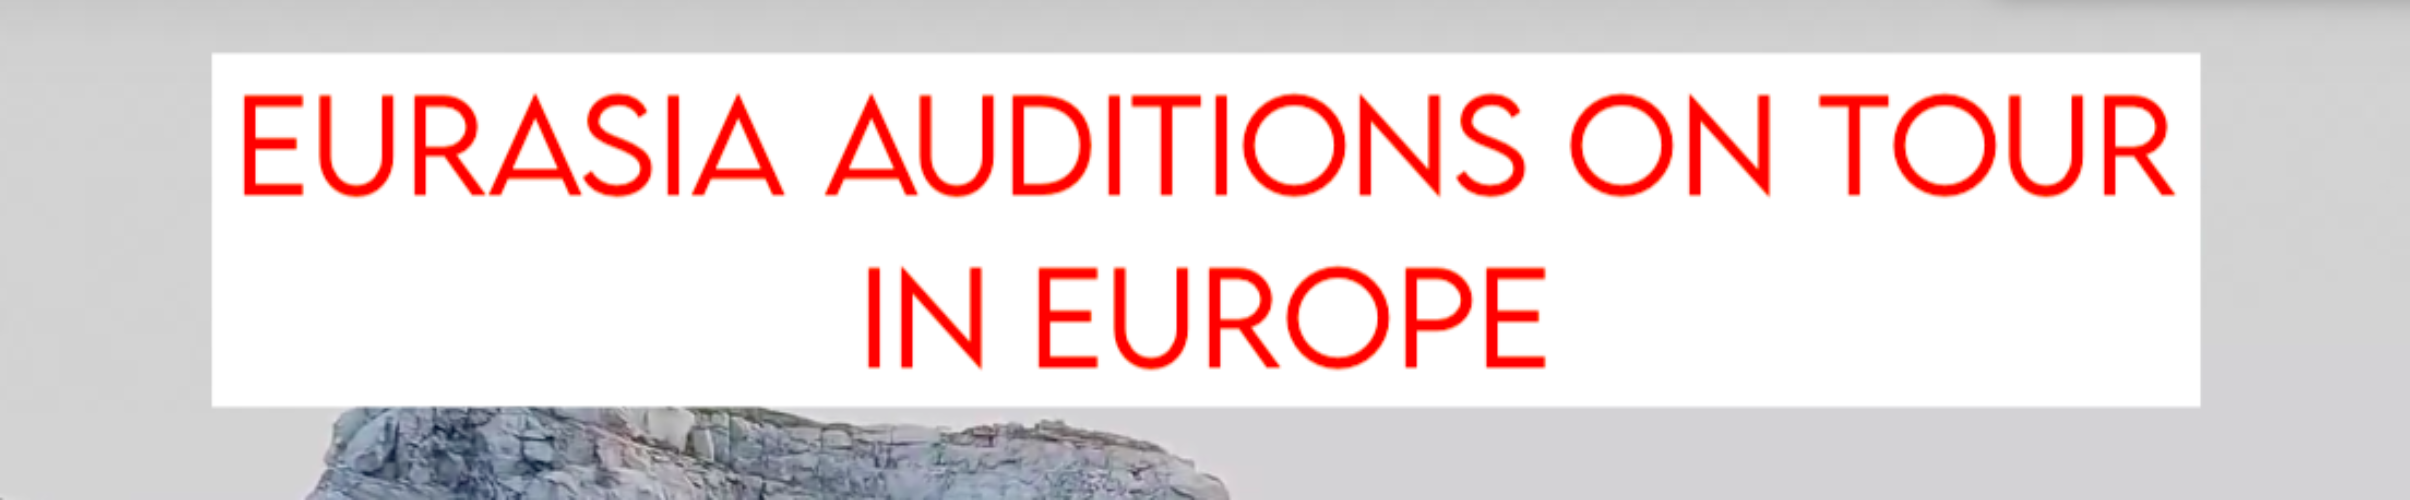 EurAsia Auditions Europe